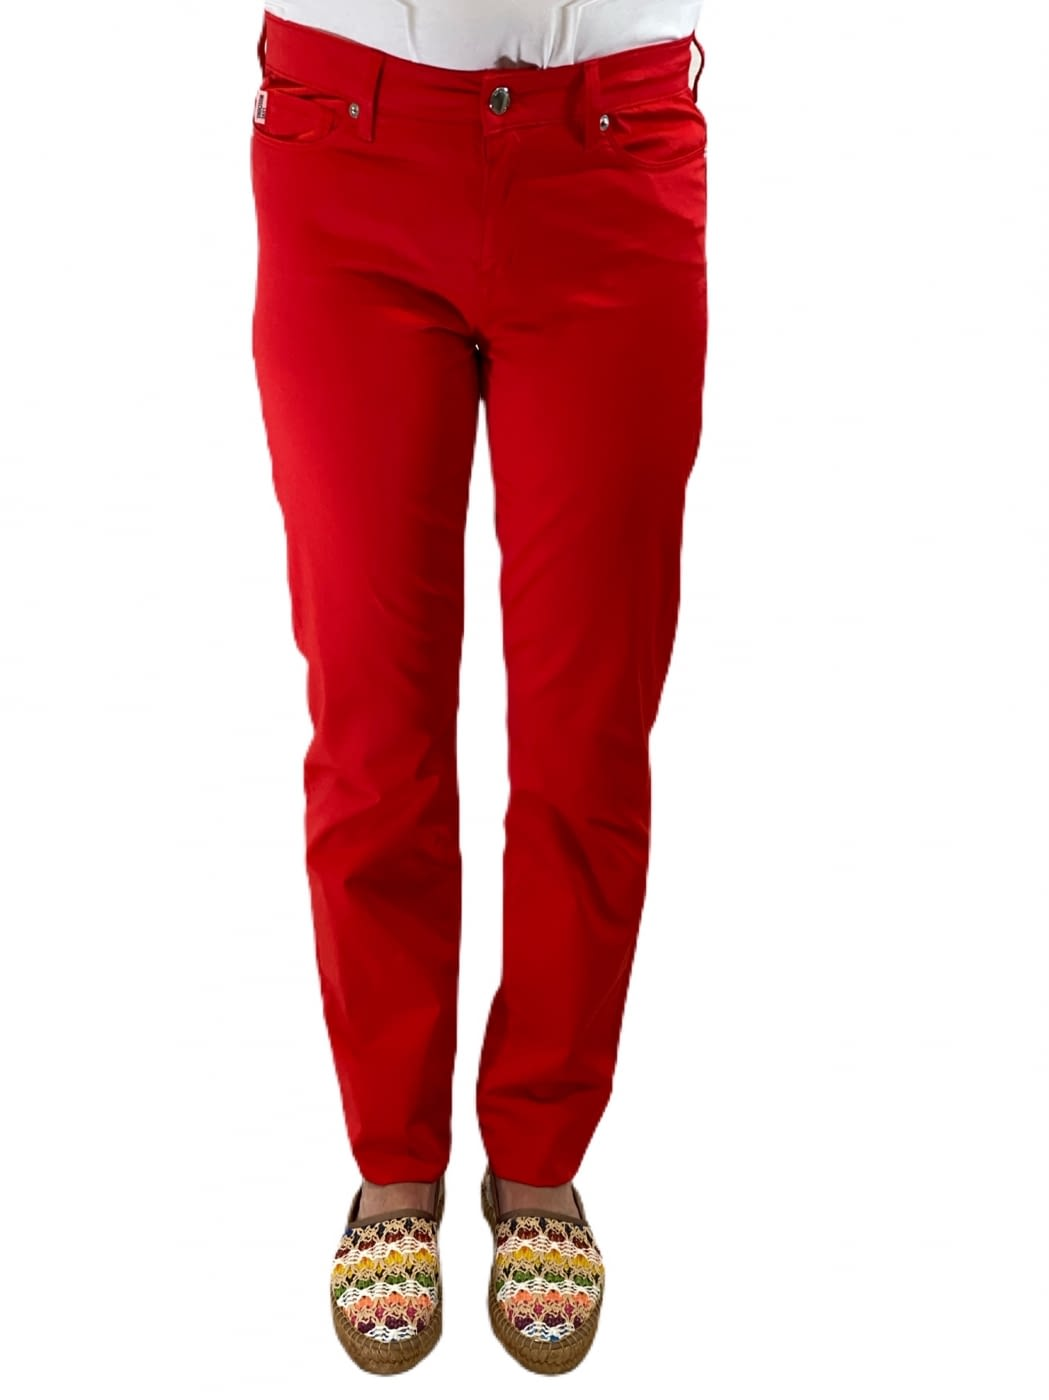 LOVE MOSCHINO pantalón rojo fantasía bolsillos